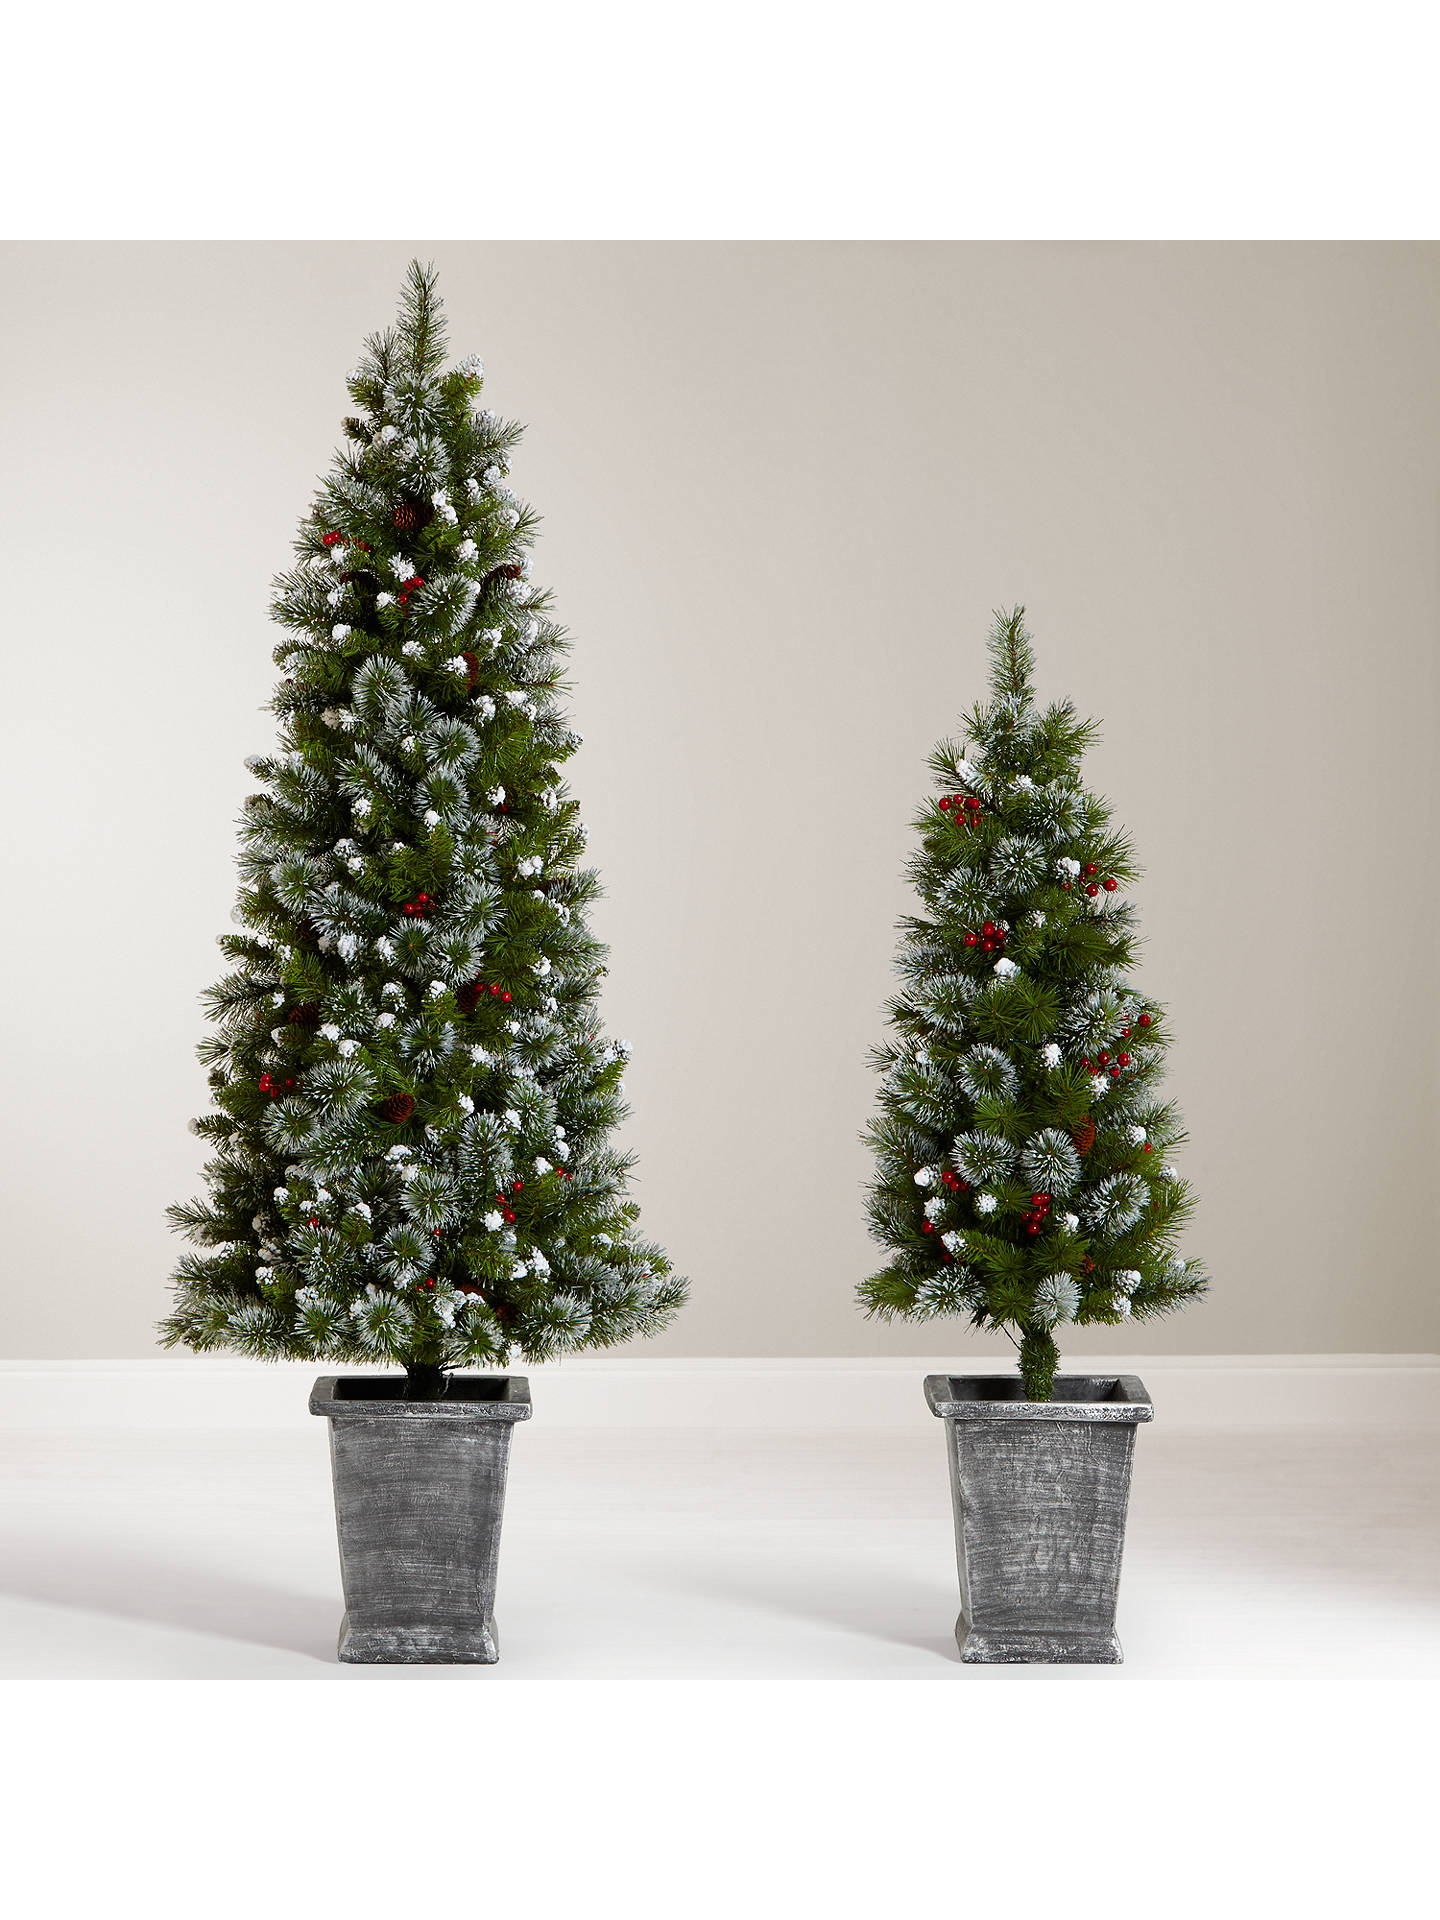 John Lewis & Partners Chamonix 6ft Pre-Lit Potted Christmas Tree at John Lewis & Partners